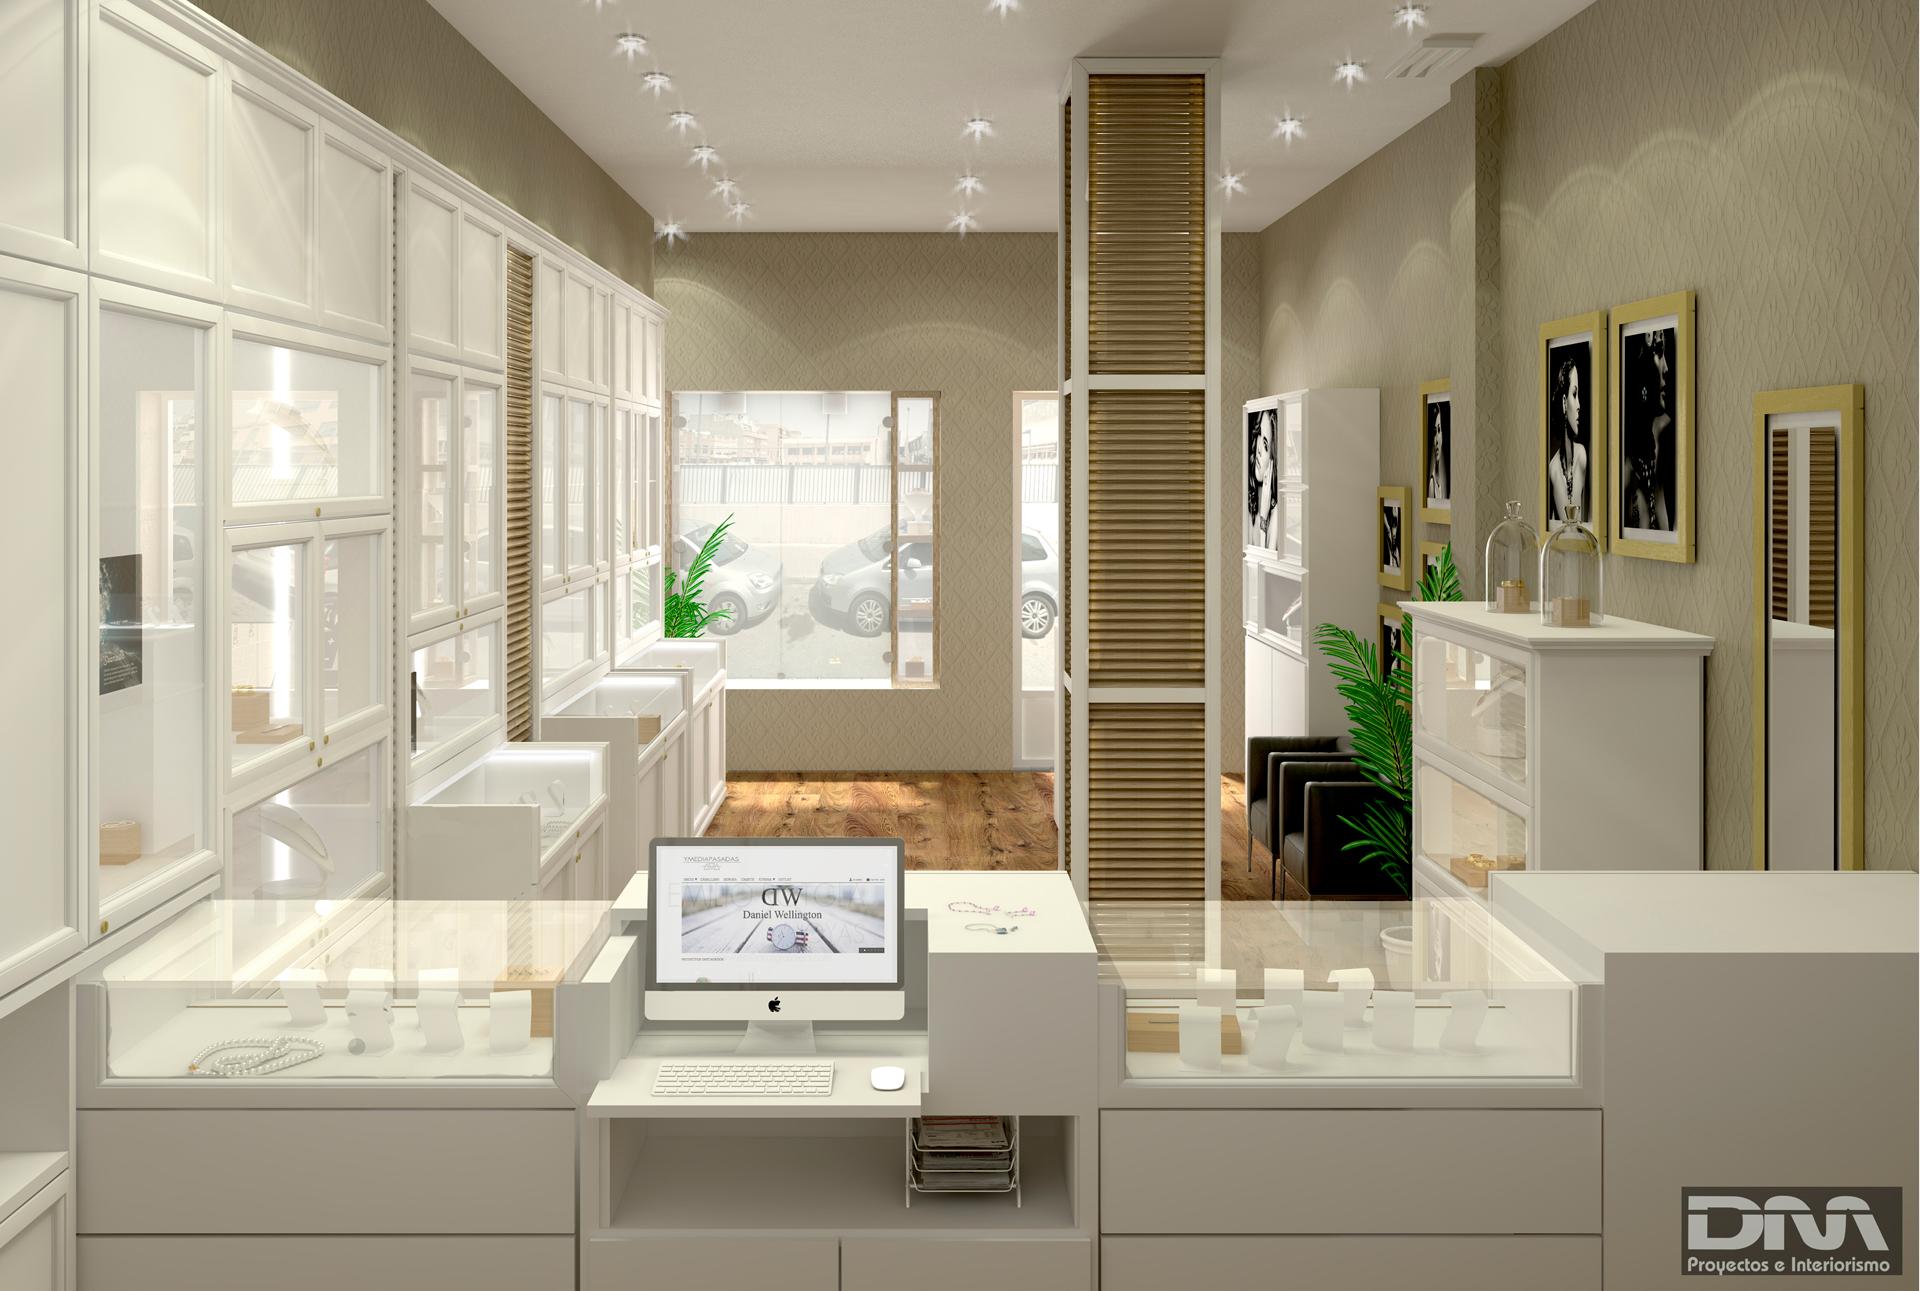 Charming Vista Interior Mostrador Proyecto Estudio Interiorismo Joyeria Emilio